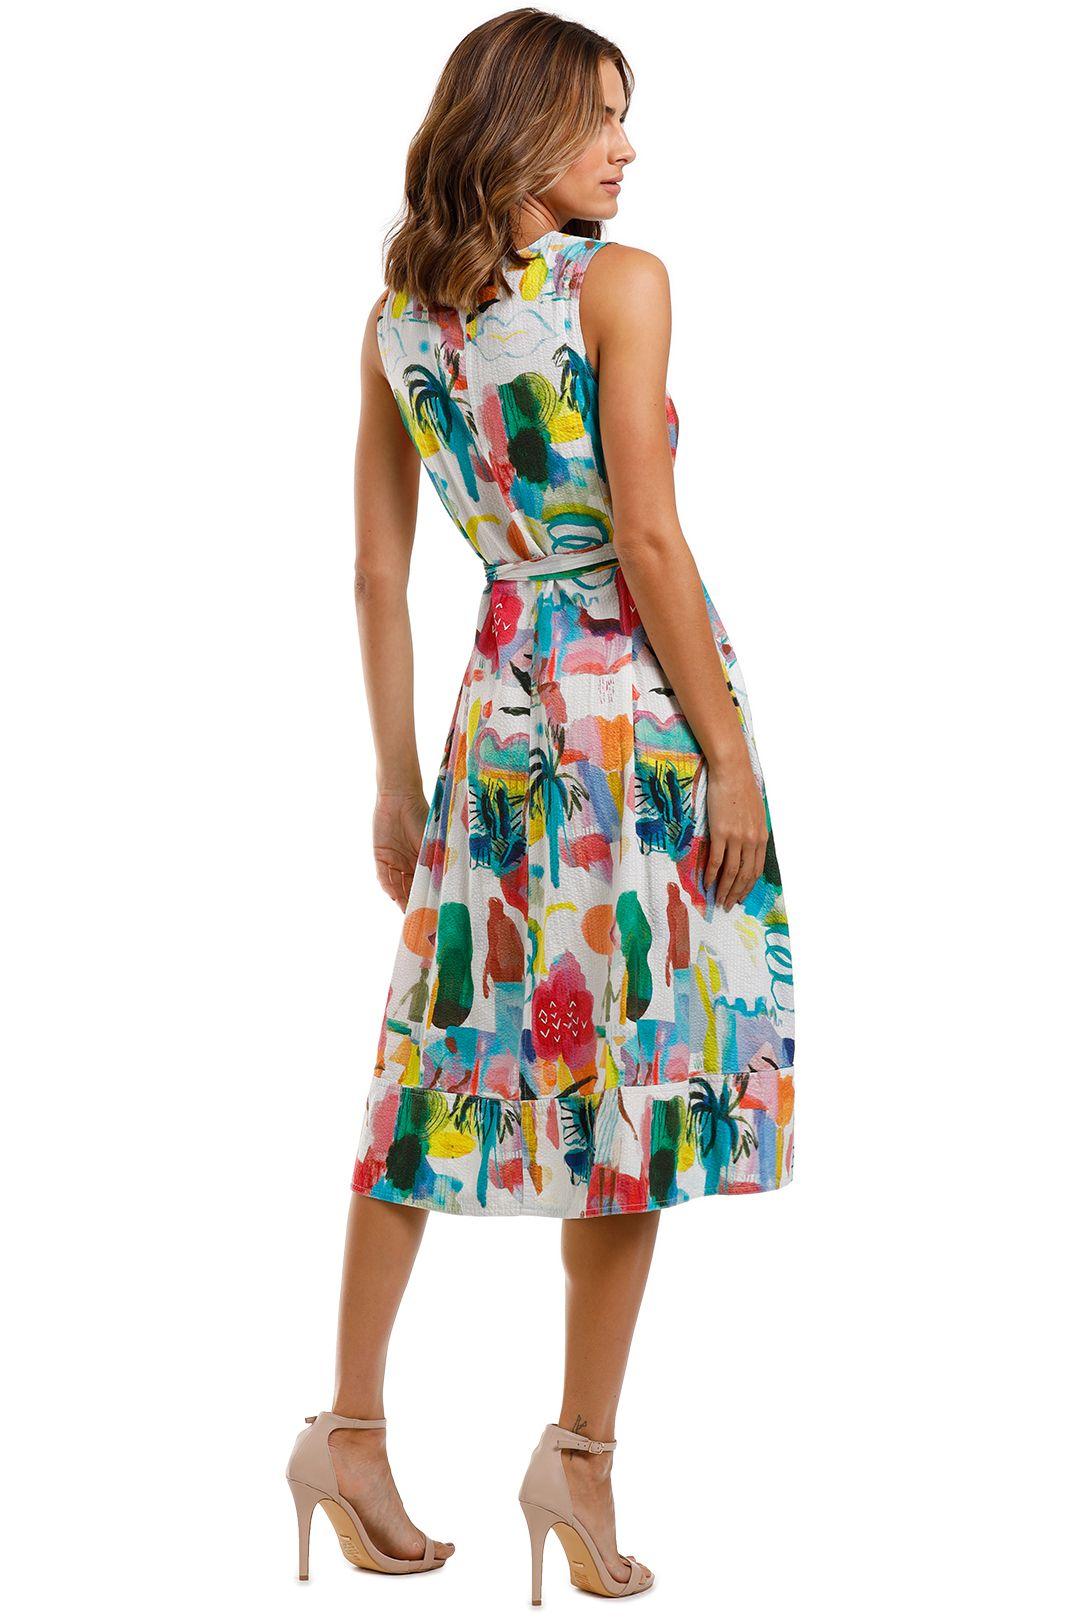 Gorman Shadow Pattern Dress Printed